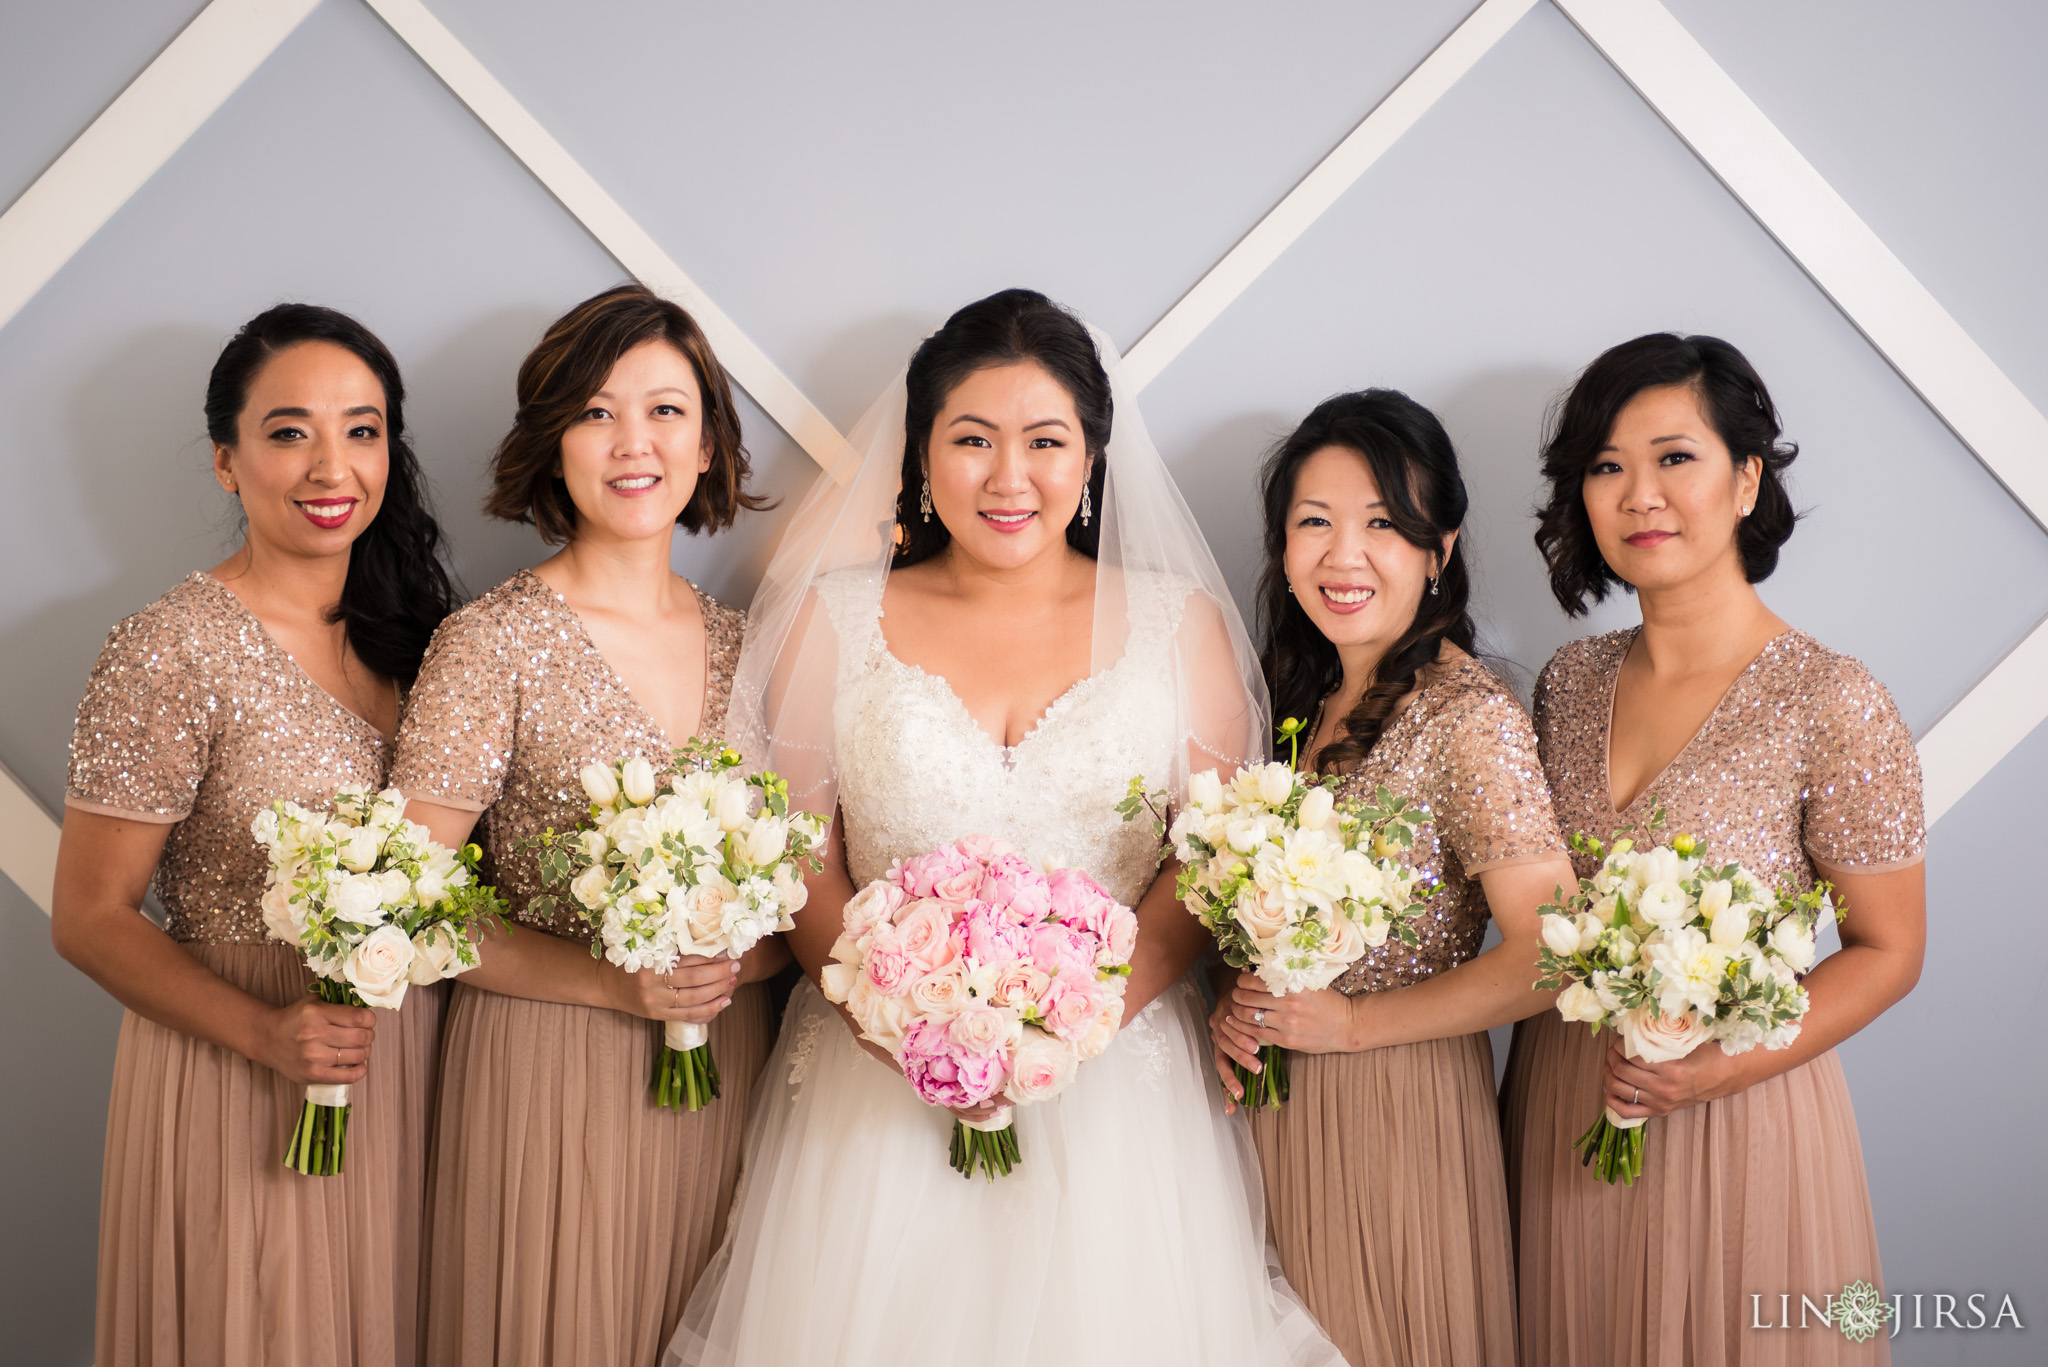 06 portofino hotel redondo beach bridesmaids wedding photography